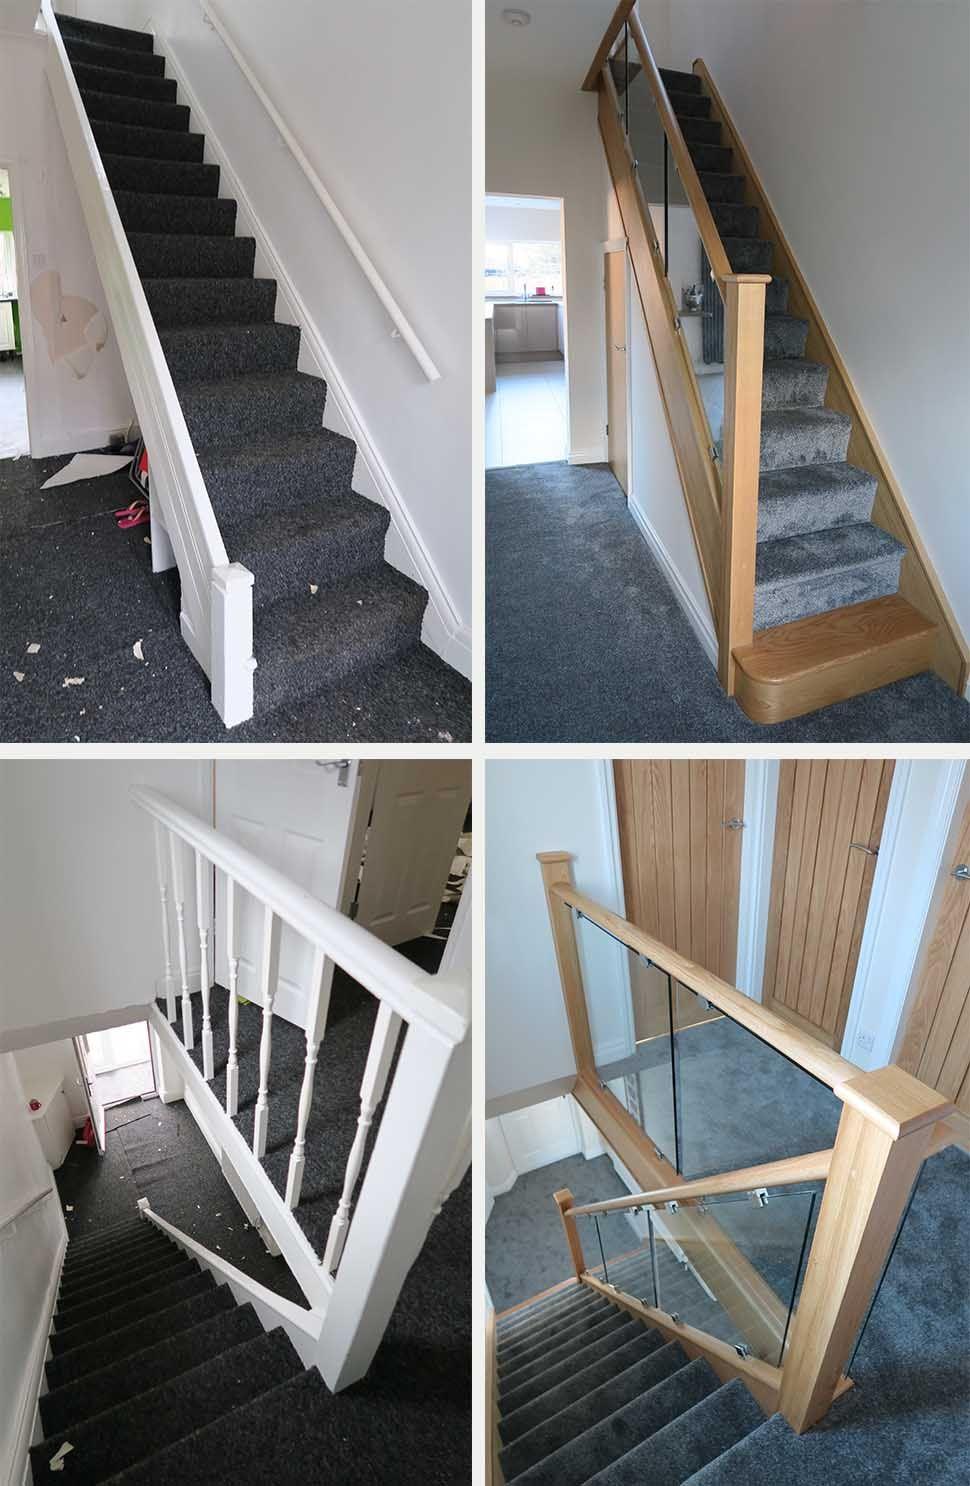 Stair Renovation Ideas   Walesfootprint.org